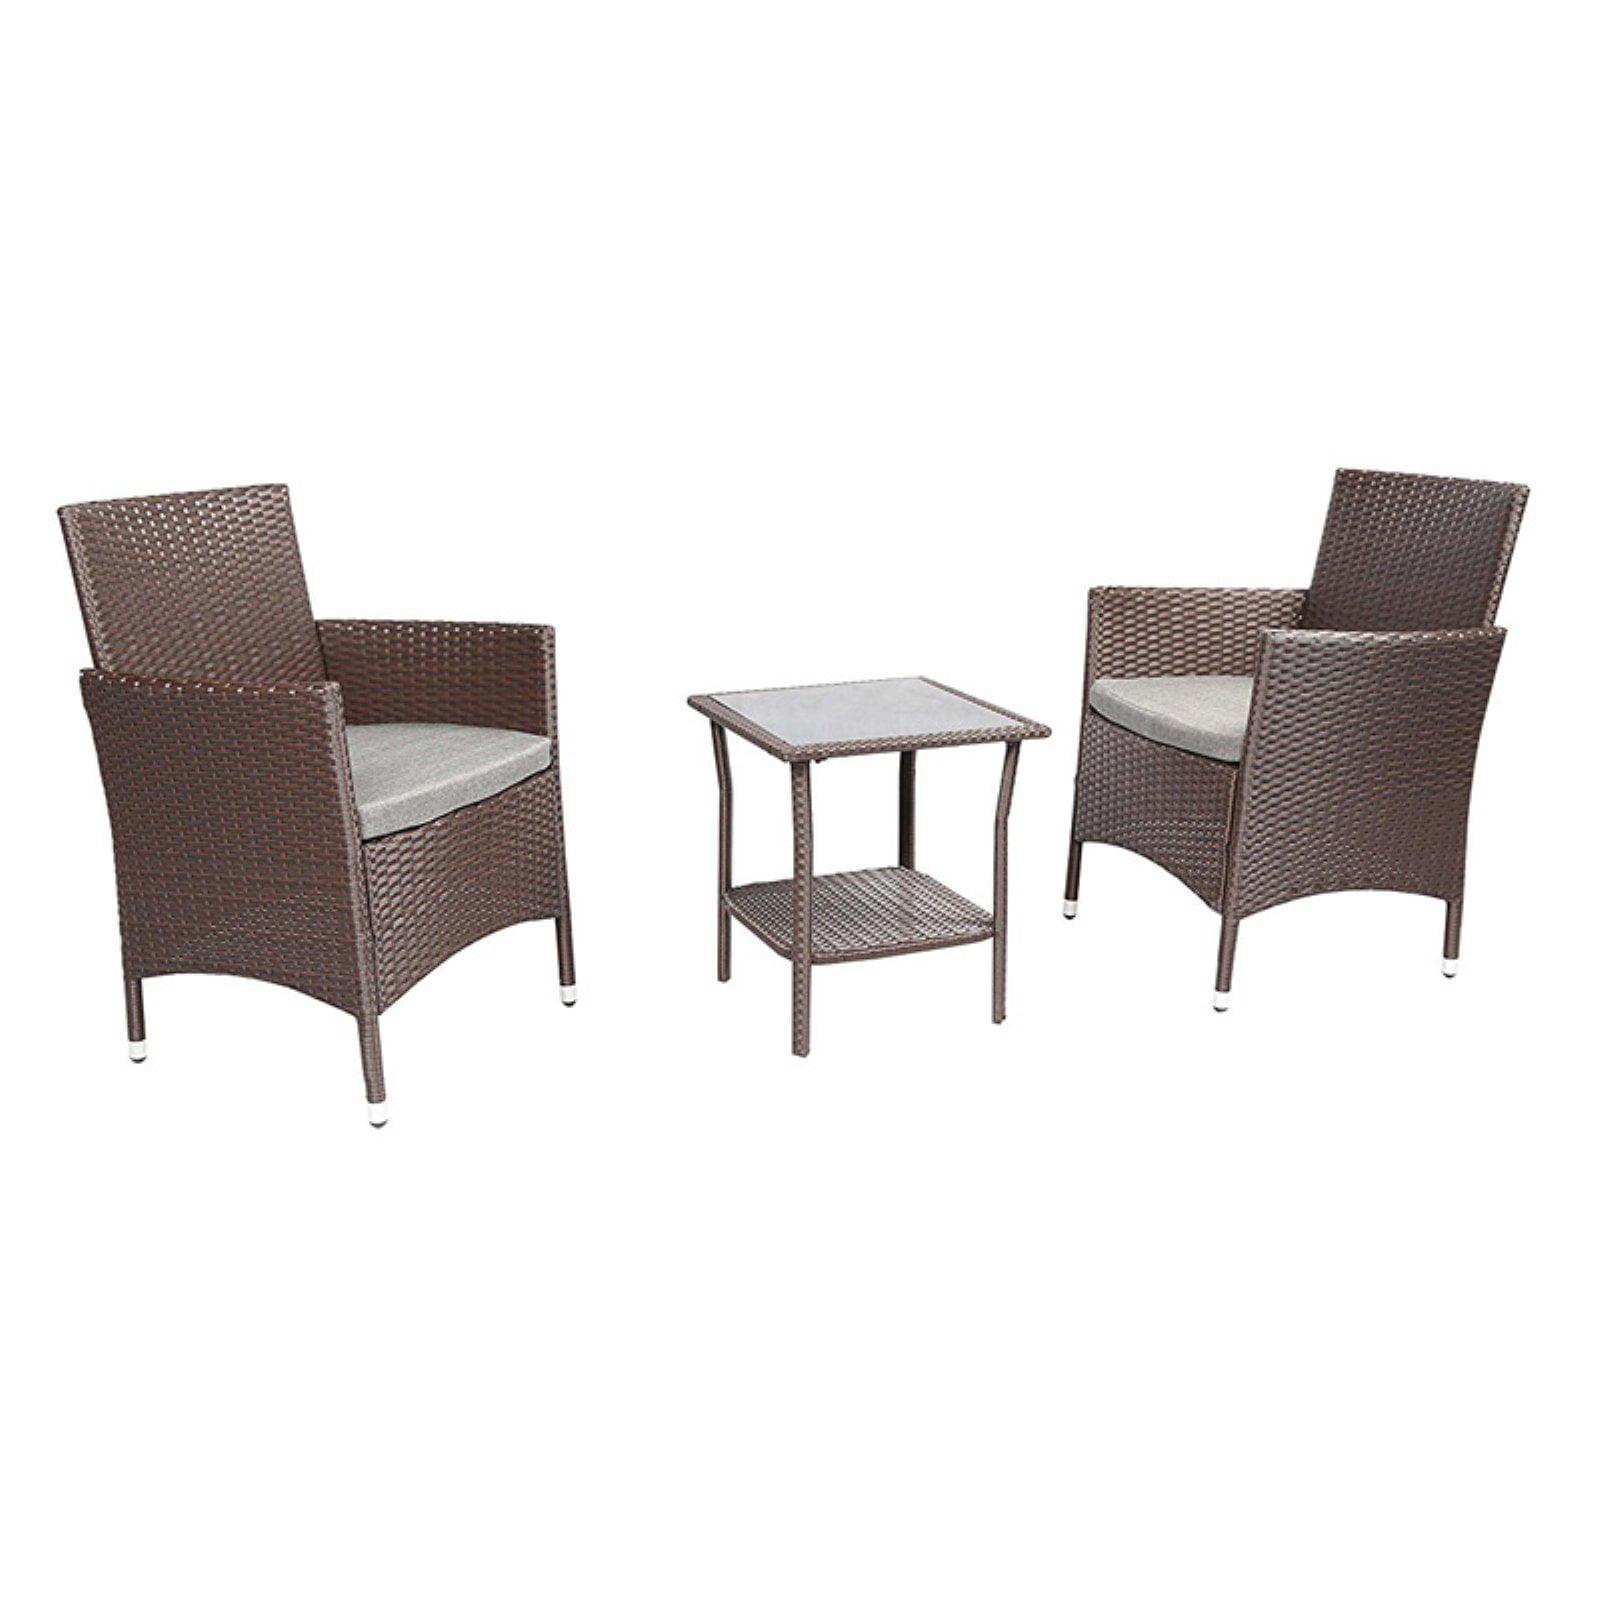 Baner Garden 3 Pieces Outdoor Furniture Complete Patio Wicker Rattan Conversation Set,... by Caesar Hardware